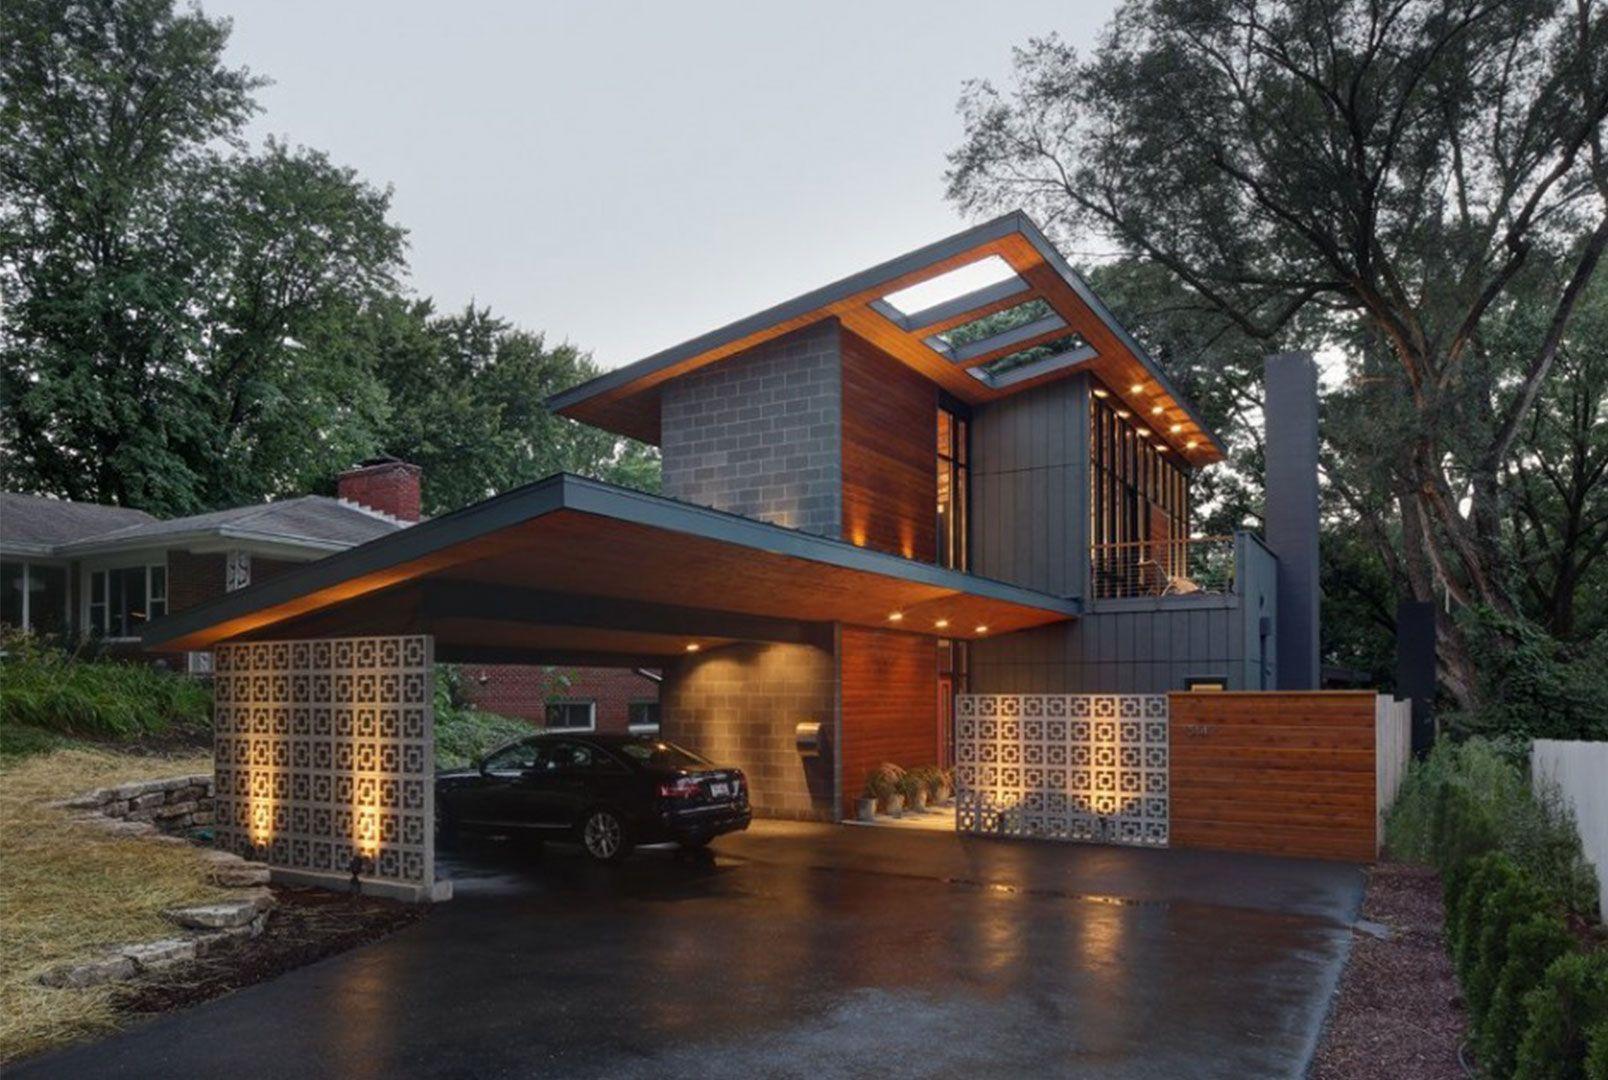 Sensational 17 Best Images About Front Door On Pinterest Brick Garden Grey Largest Home Design Picture Inspirations Pitcheantrous